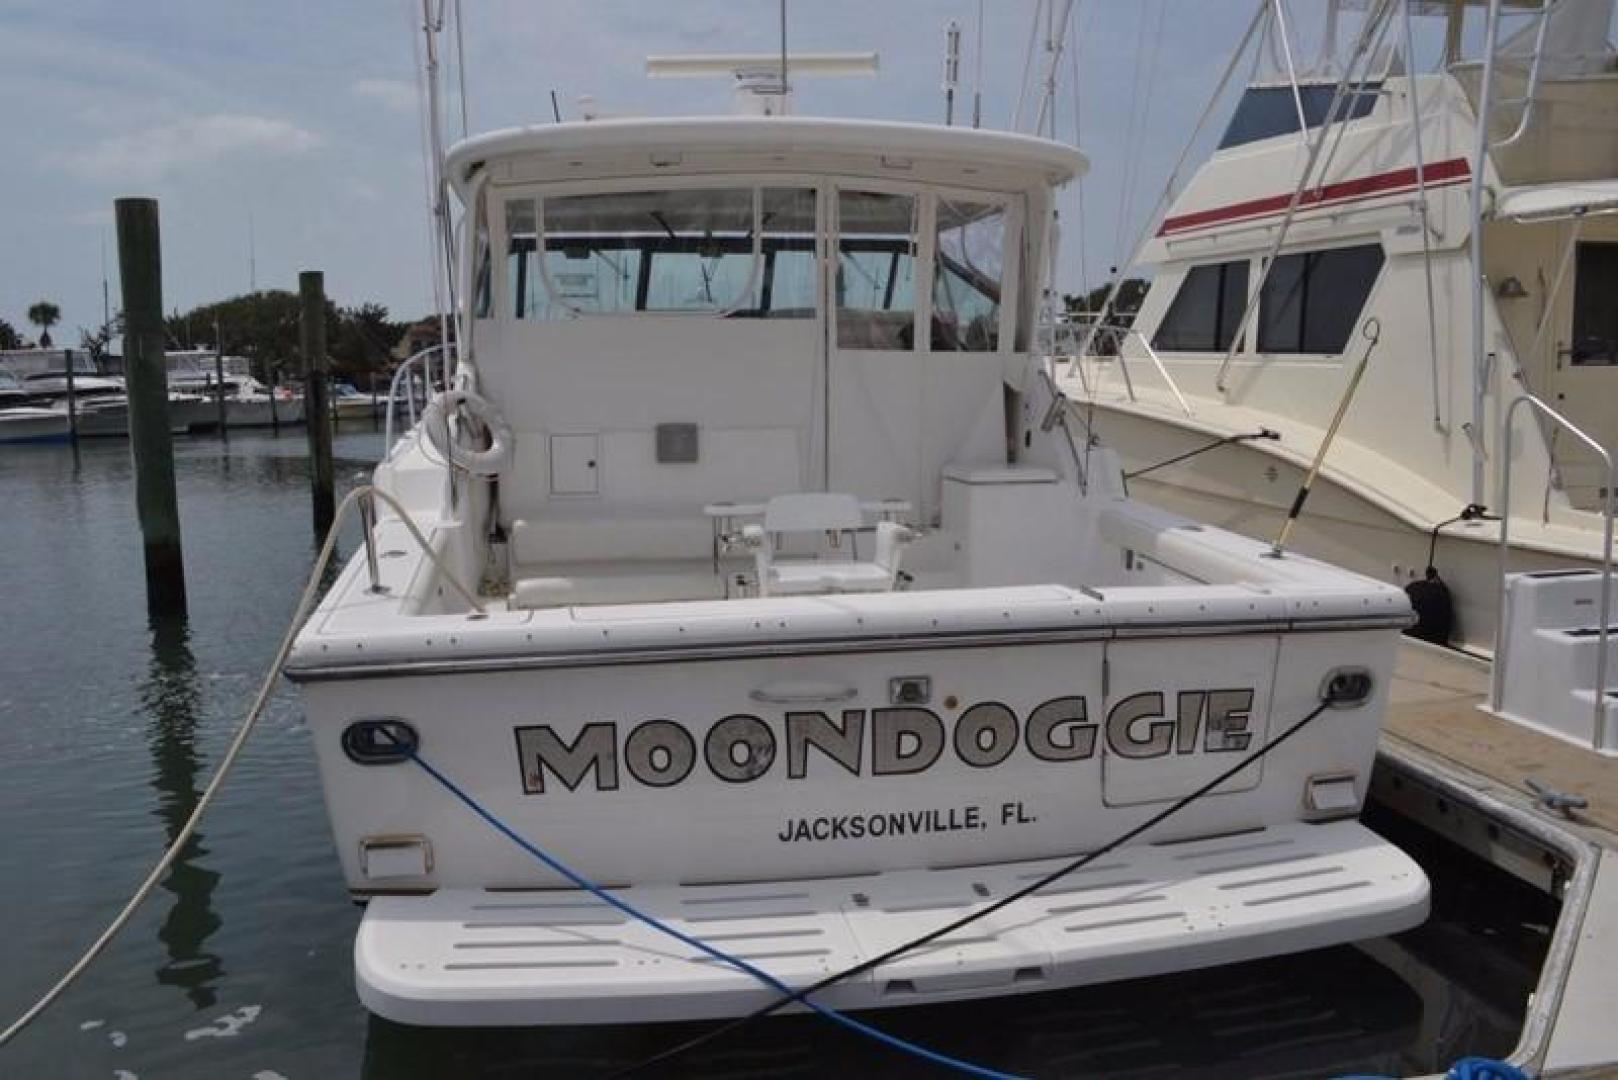 Tiara-4100 Open 2000-Moondoggie St. Augustine-Florida-United States-Stern-924418 | Thumbnail